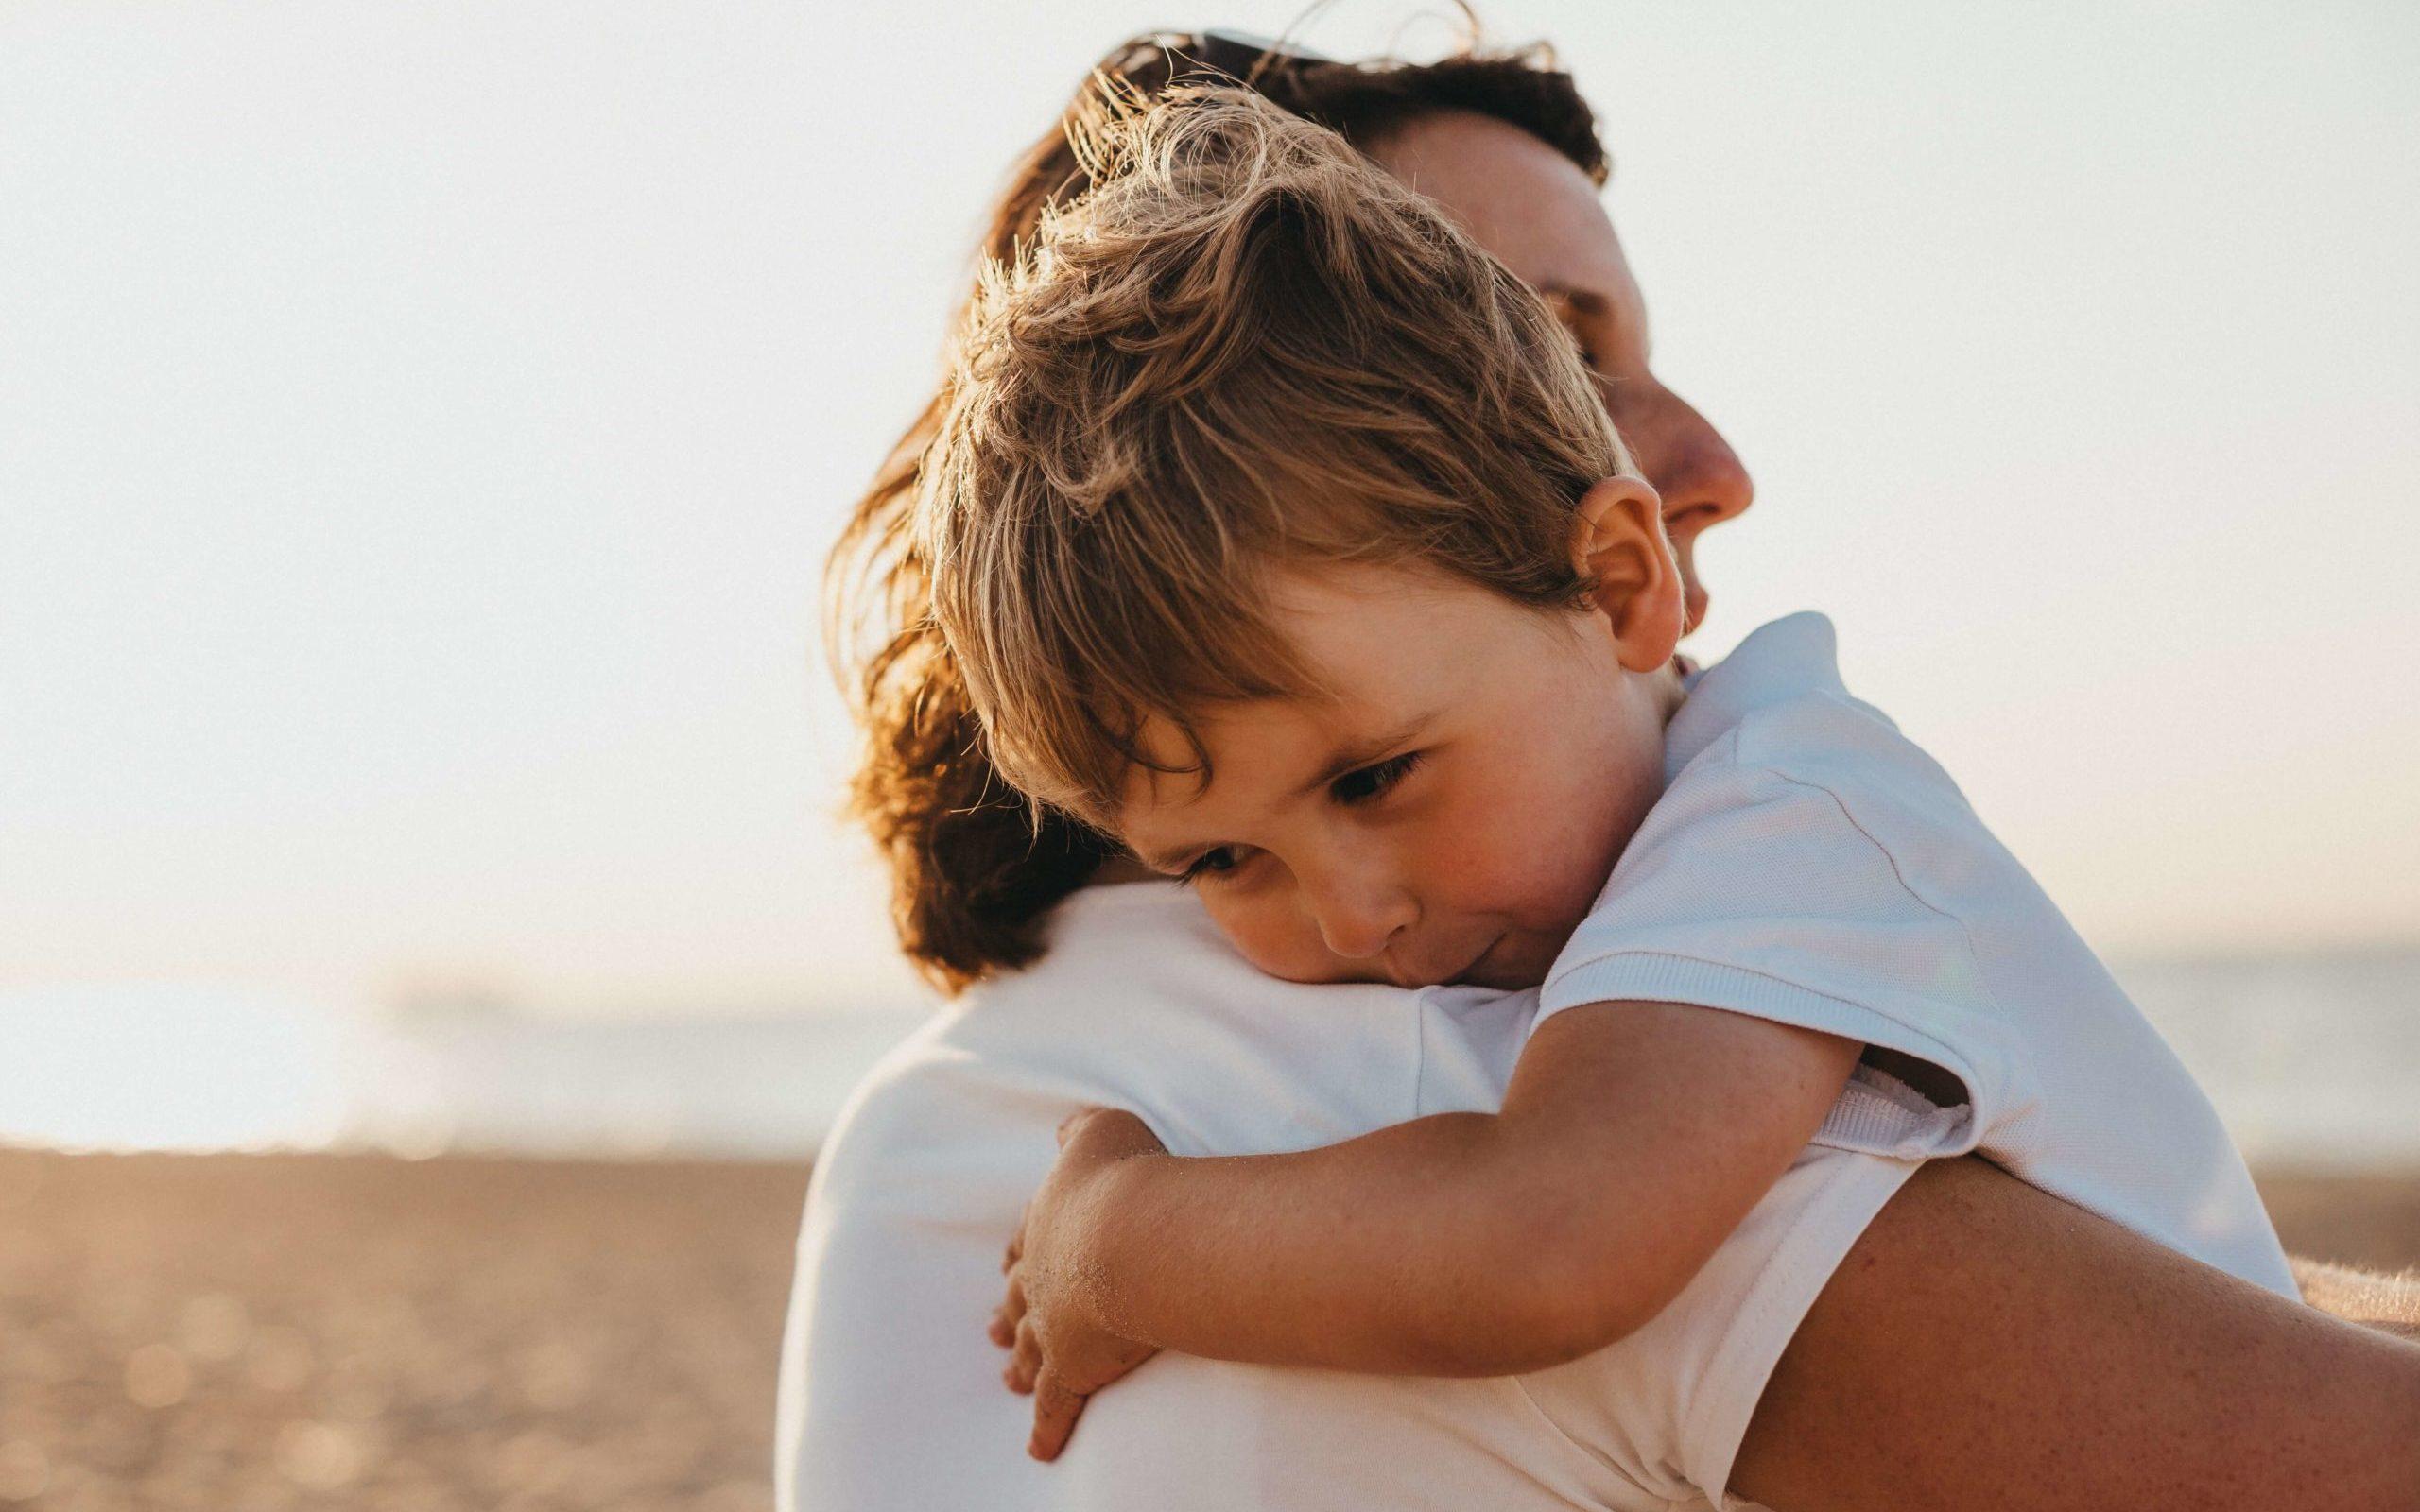 Help Your Child Through Crisis